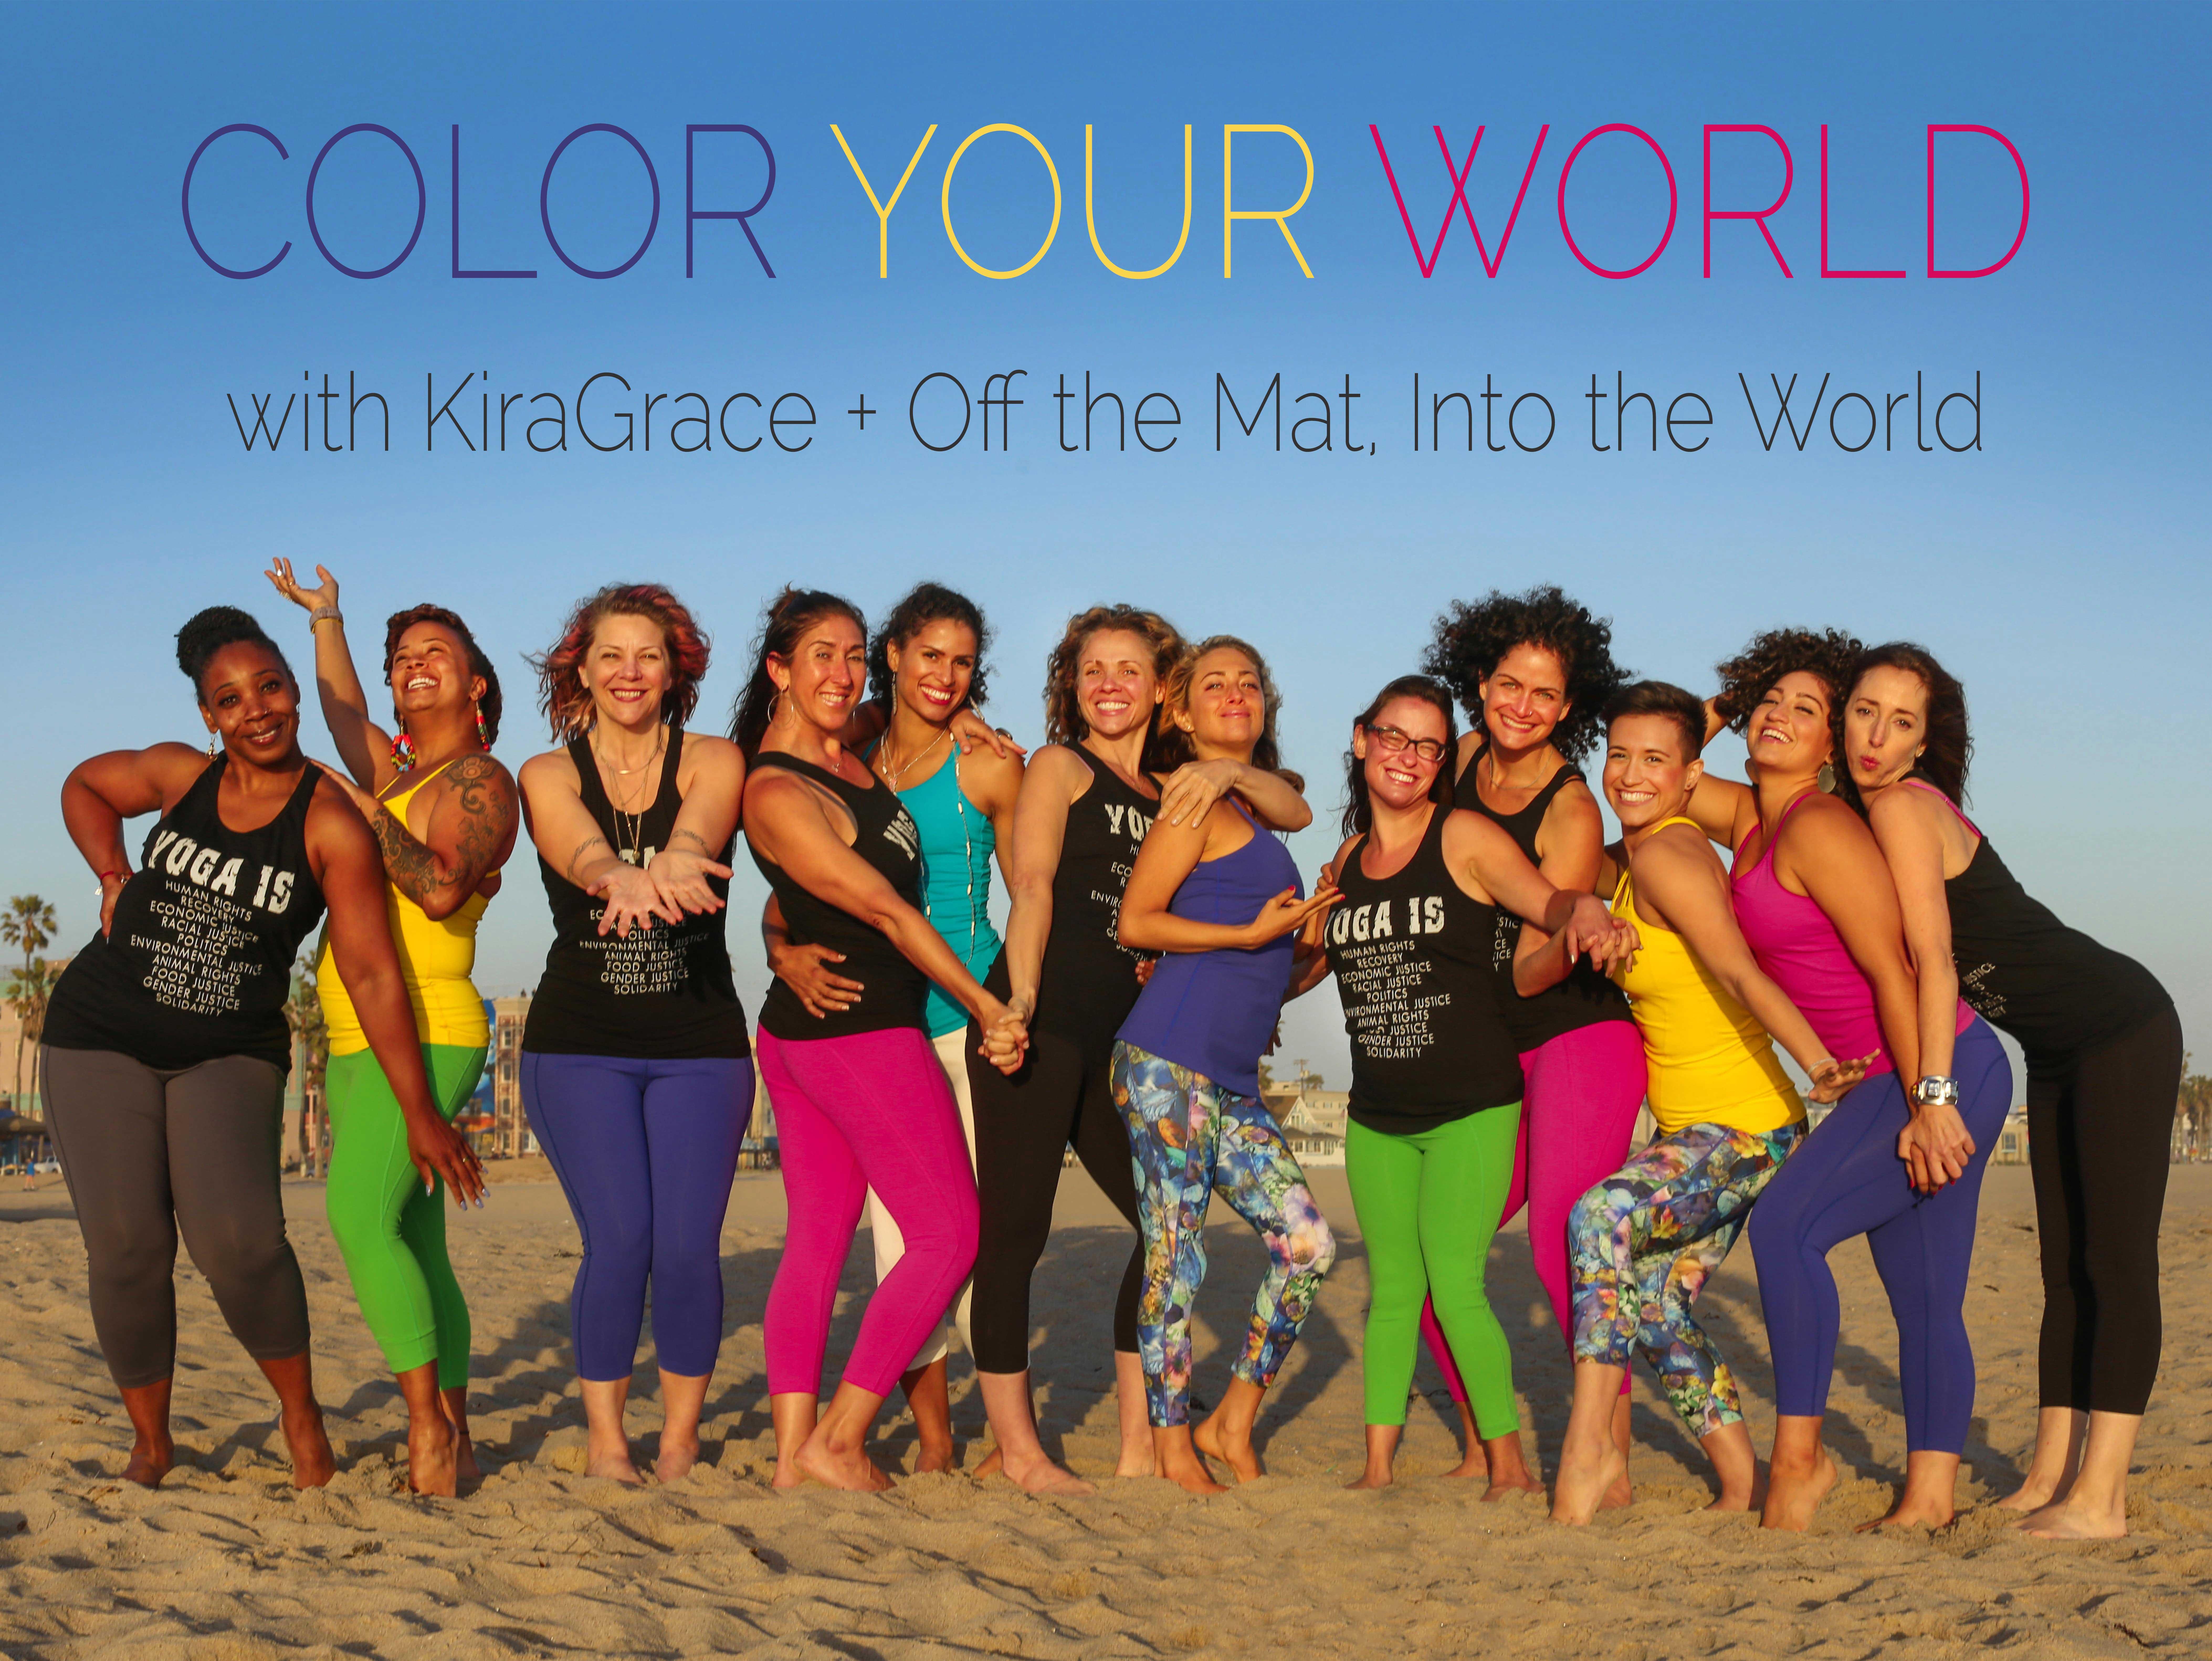 coloryourworld-wholesale-poster-min-1-.jpg